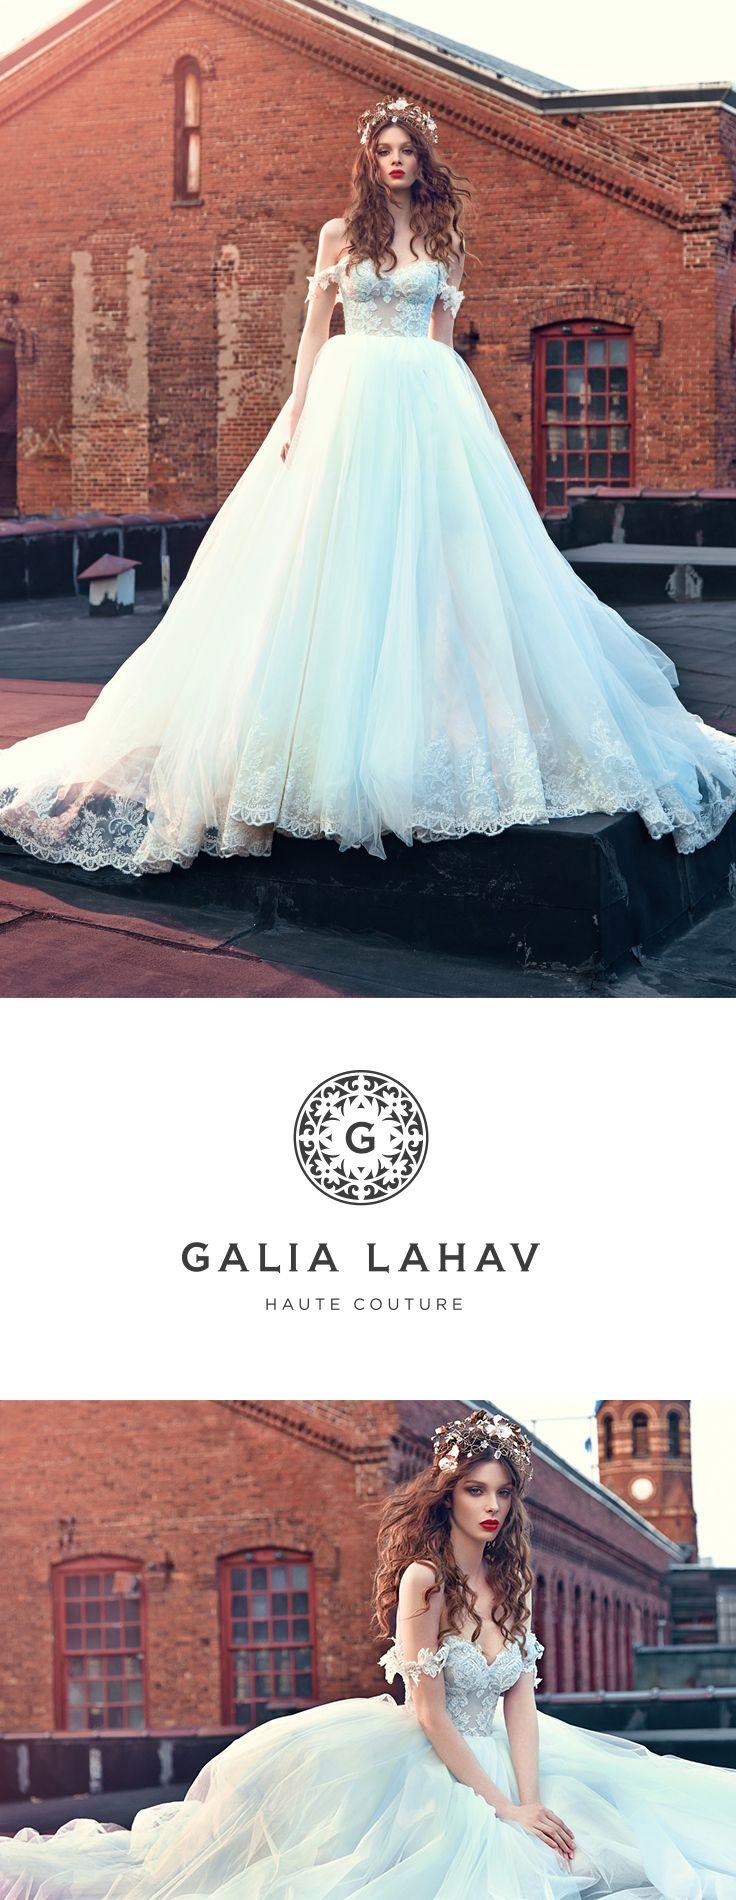 Les reves bohemians wedding board pinterest cinderella dresses